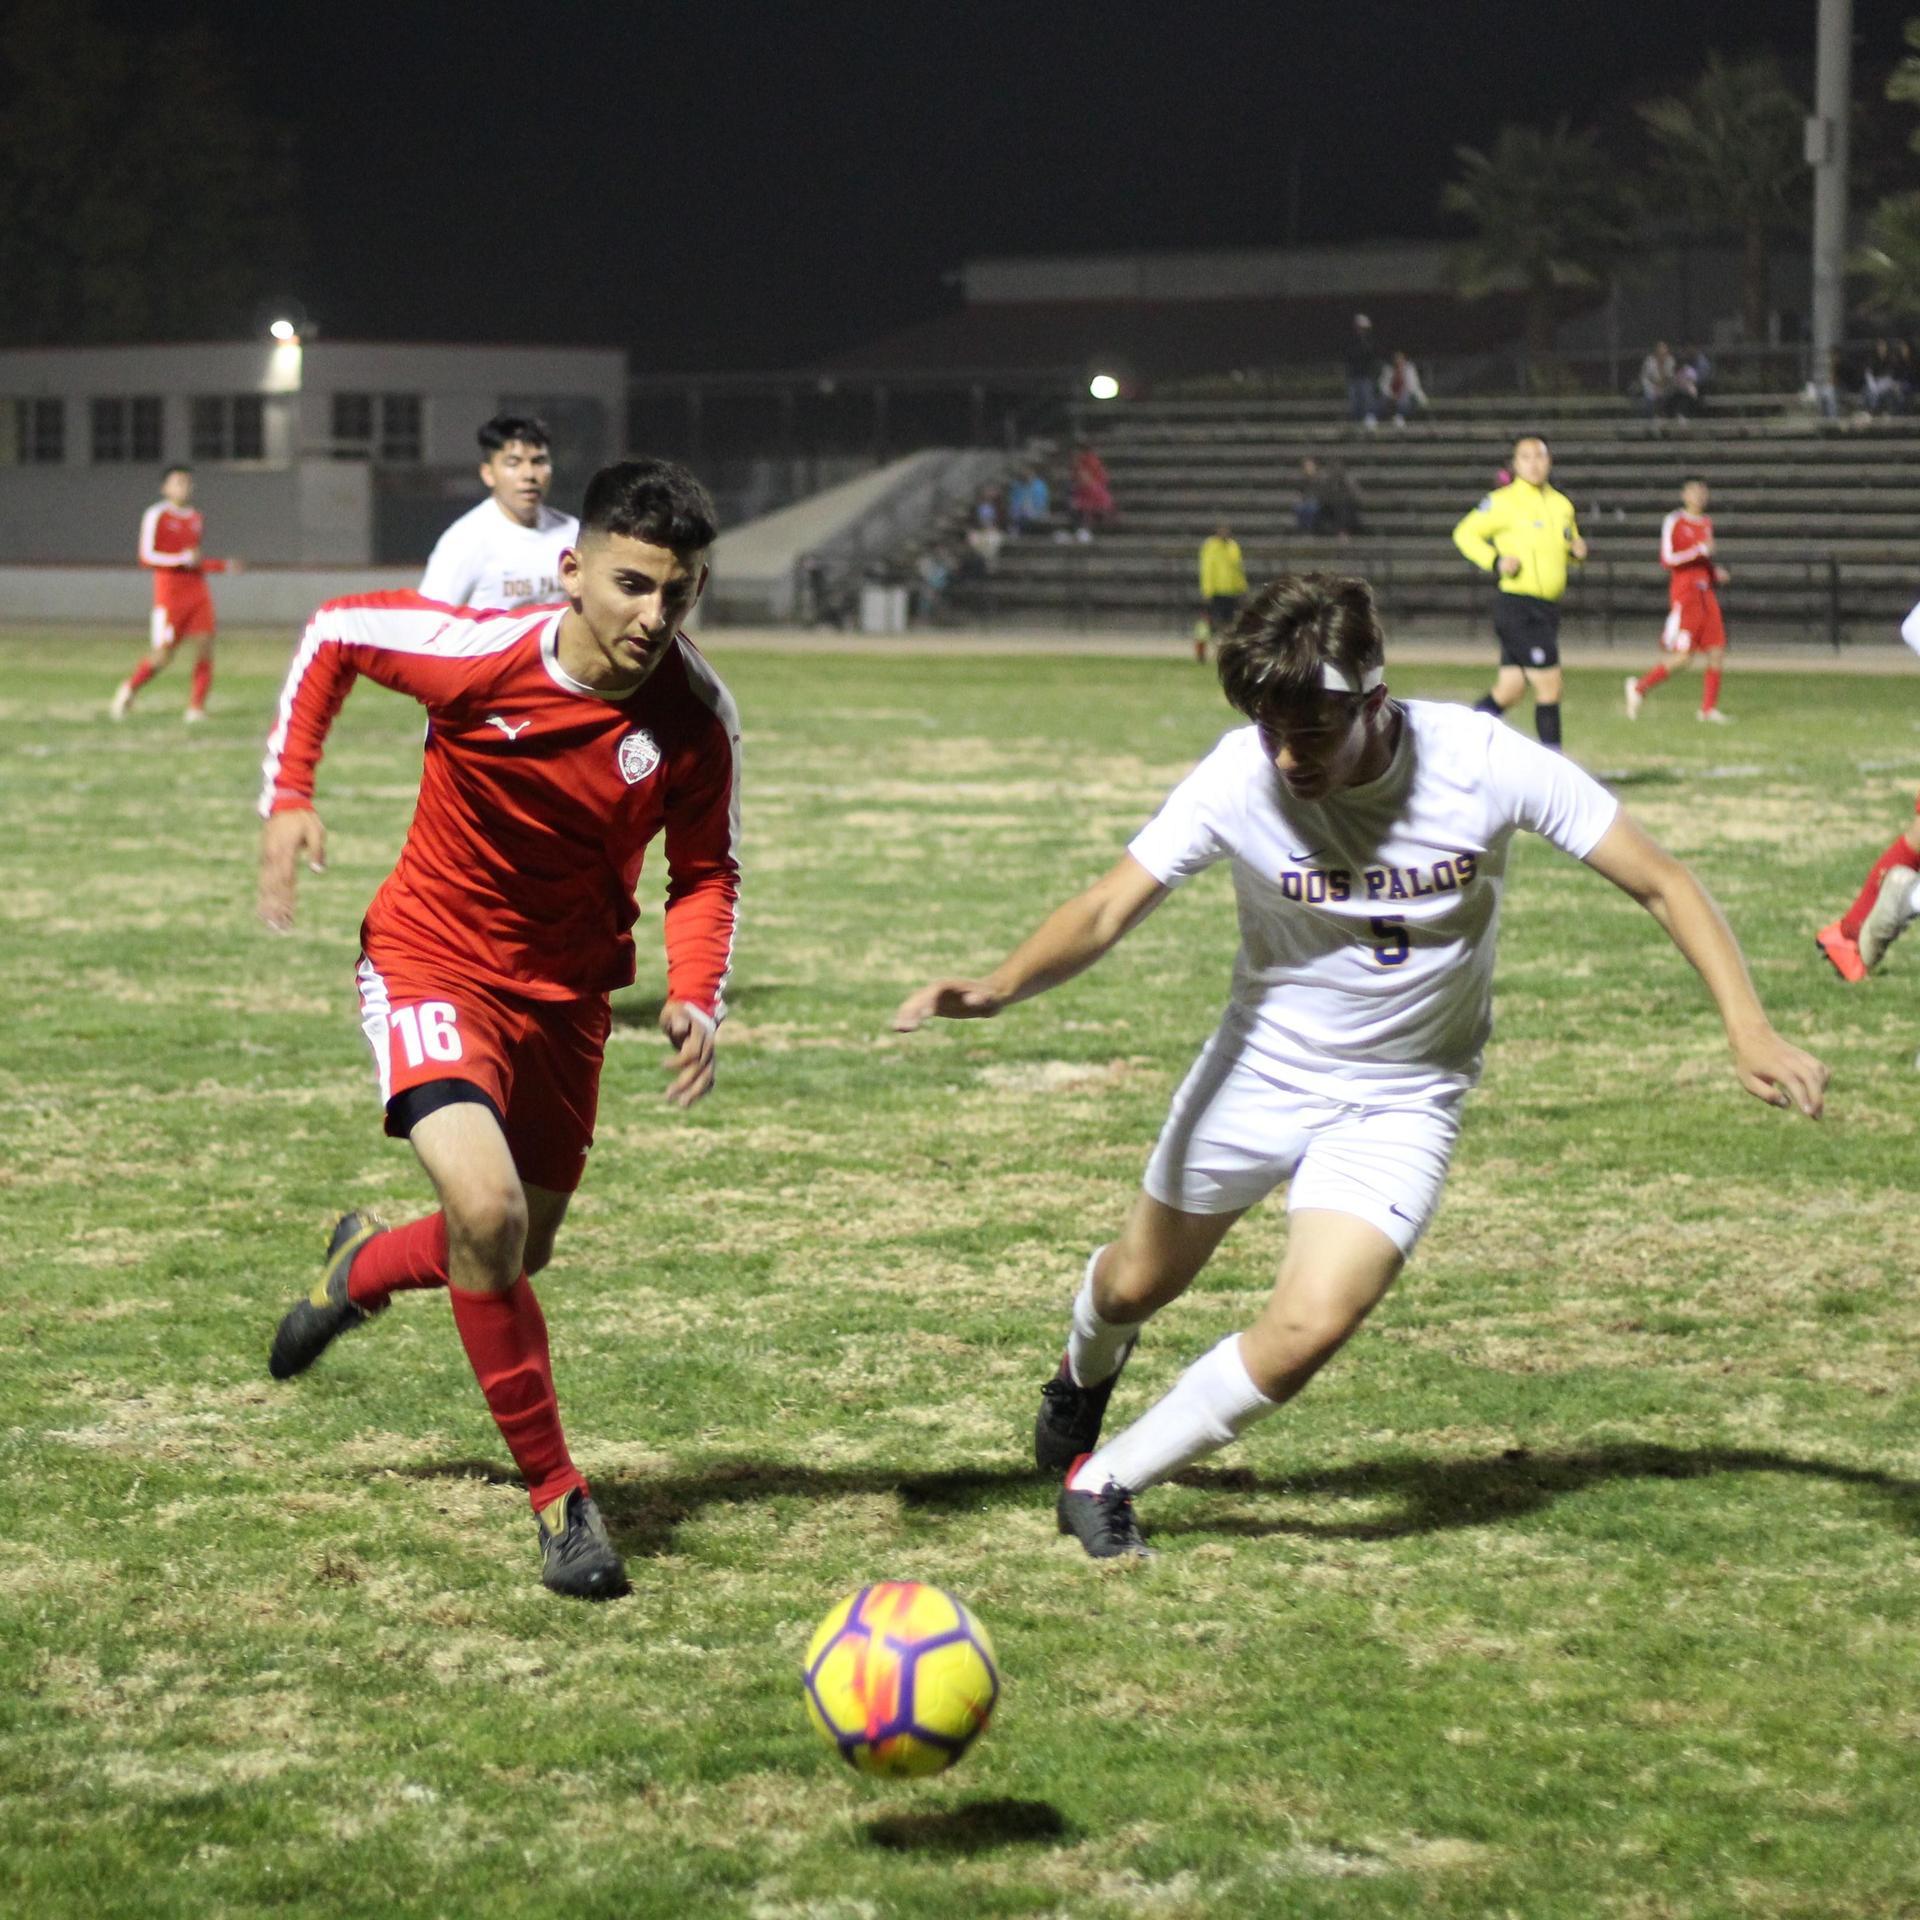 Christian Fernandez running towards the ball